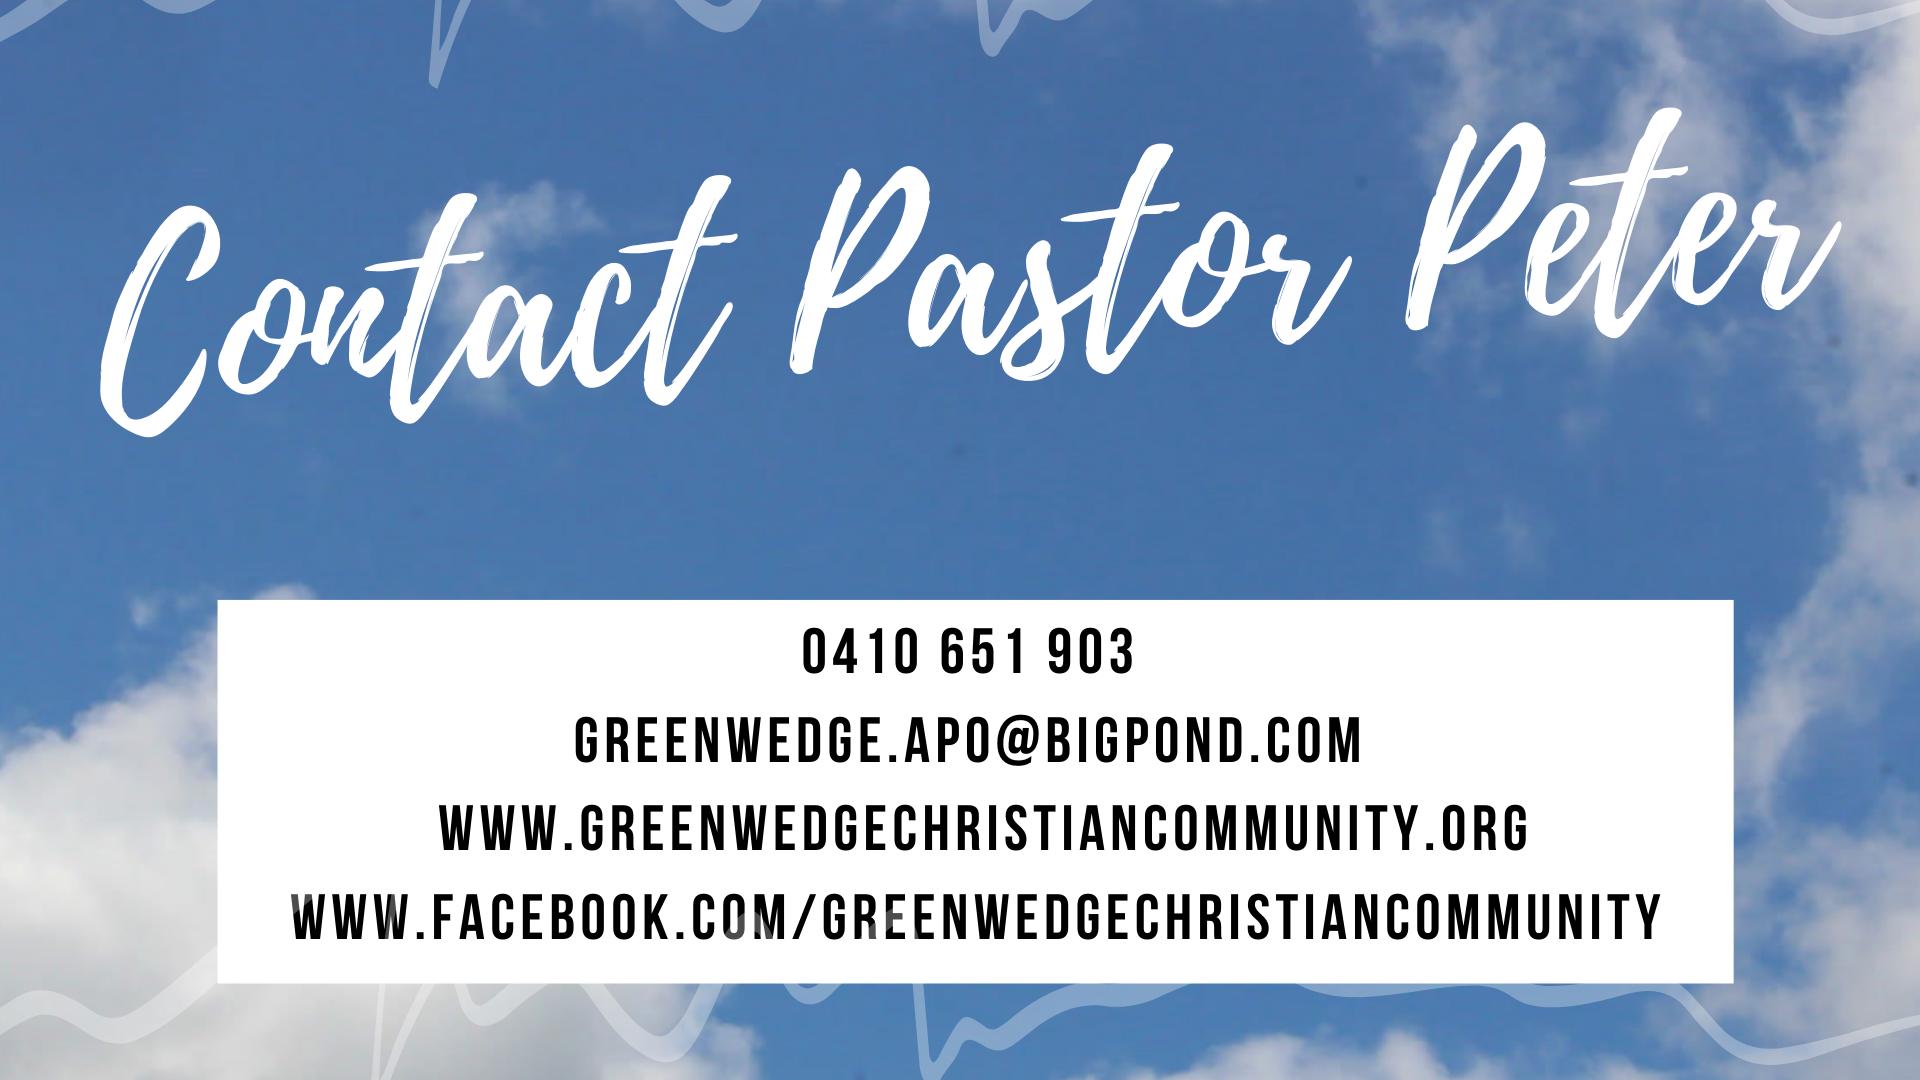 Contact Pastor Peter